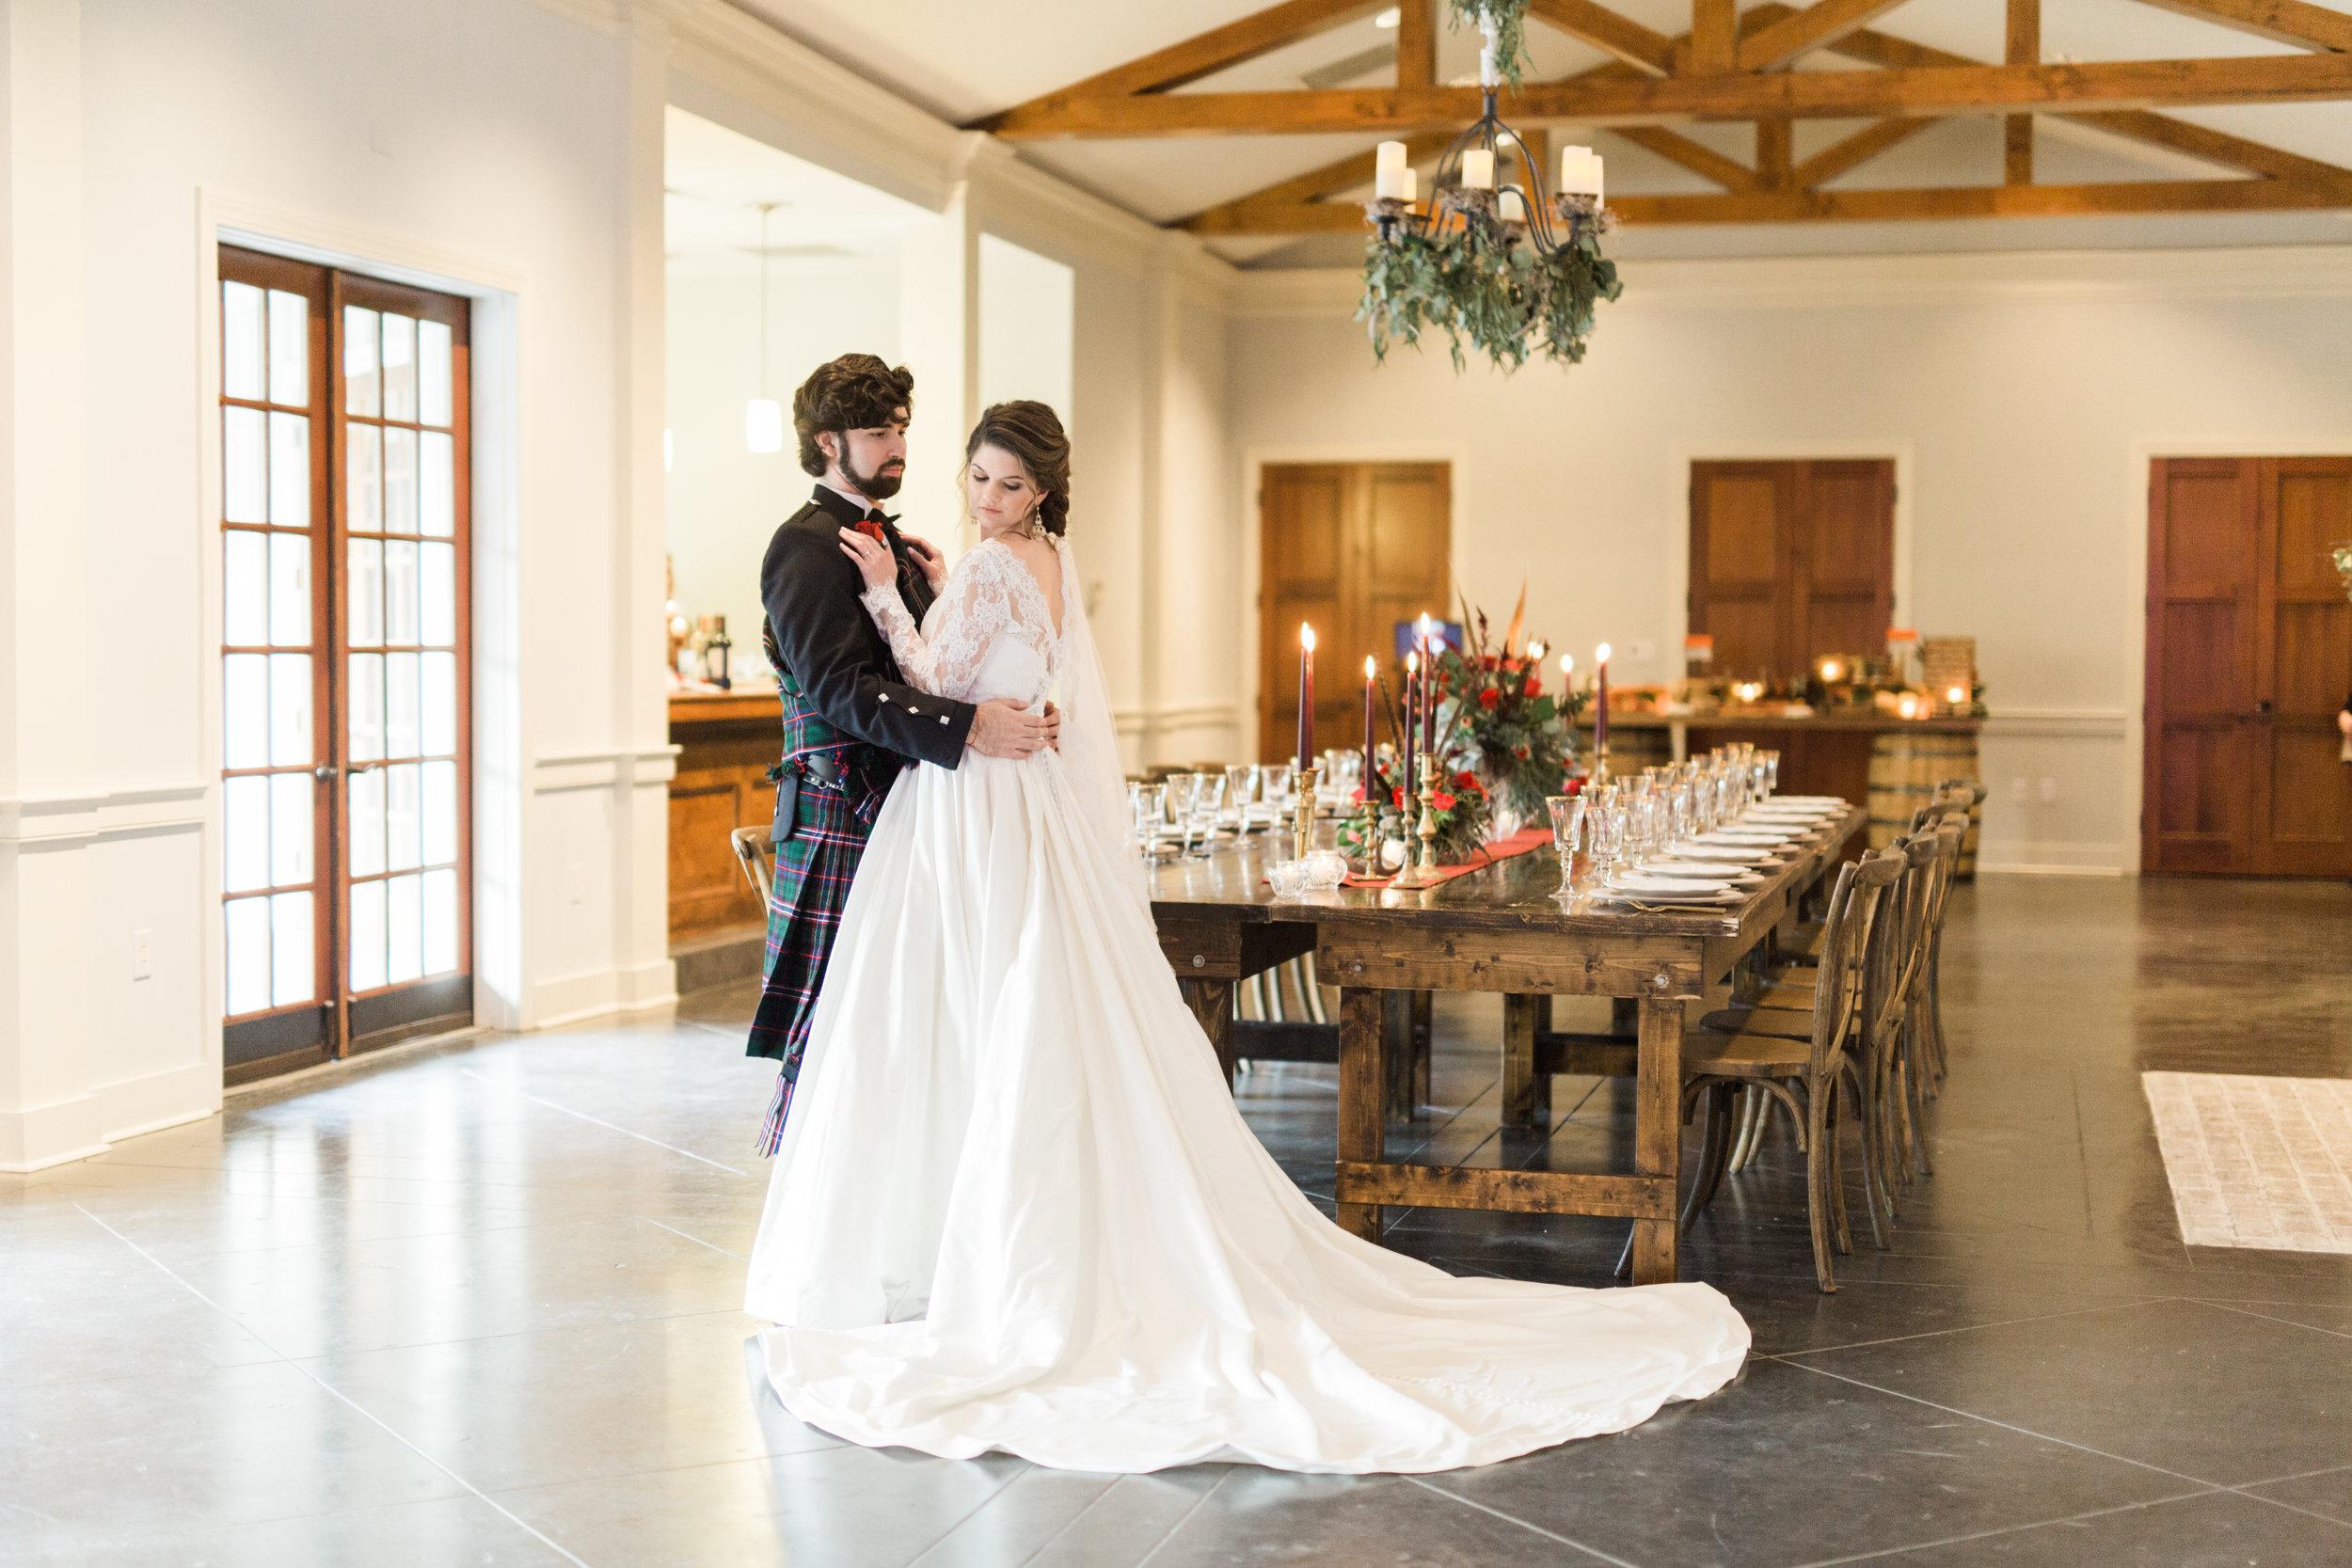 Coleman Hall & chapel Charleston Rustic Scottish Hunting Lodge Wedding - Charleston, Atlanta, Greenville Wedding Planners (96).jpg